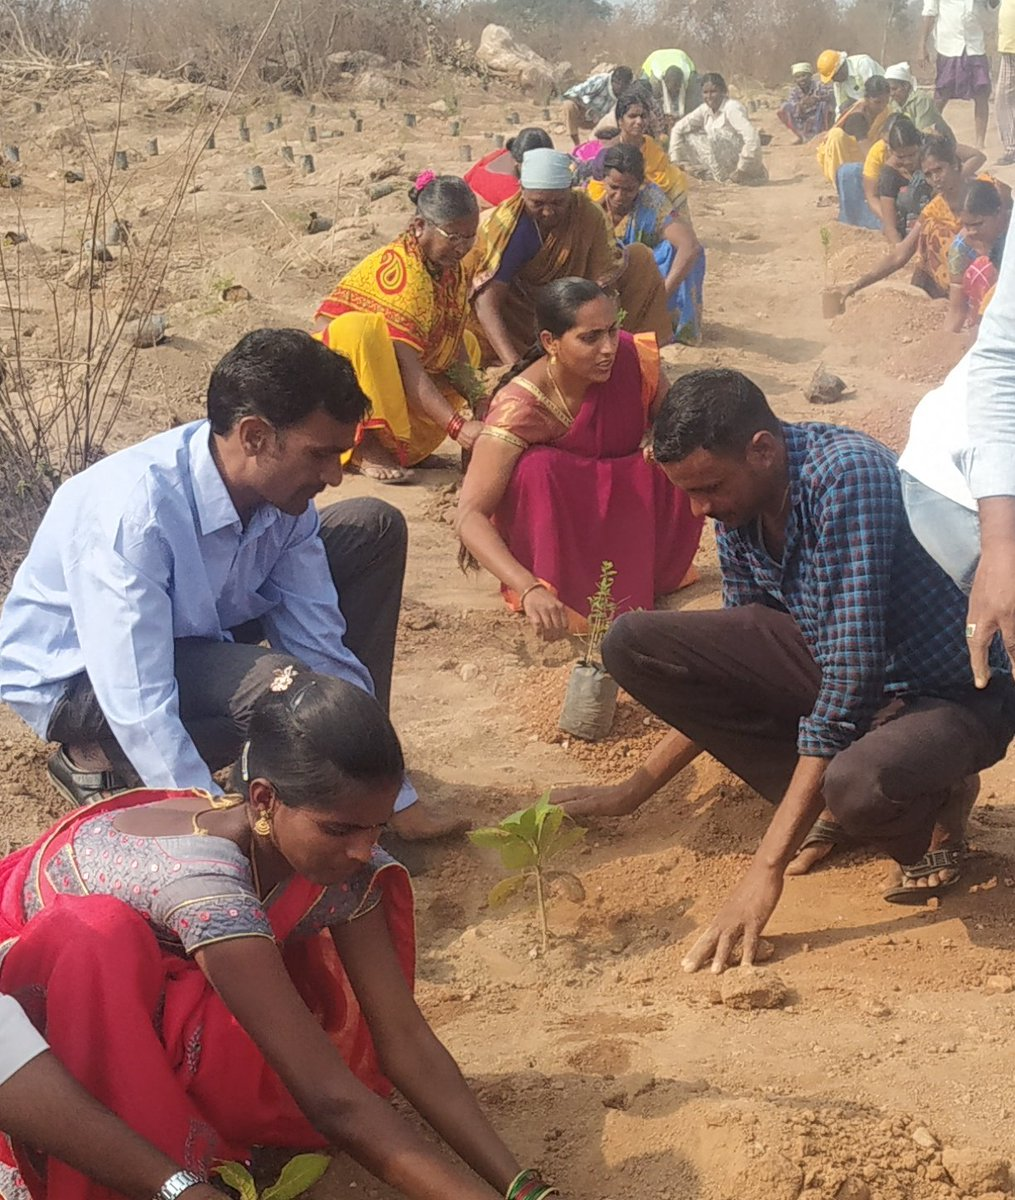 On CM KCR Sir Birthday My IKP-SERP Employees & Large No of SHG Members participated in #KotiVriksharchana #GreenIndiaChallenge  #HappyBirthdayKCRSIR  @TelanganaCMO @MPsantoshtrs @KTRTRS @RaoKavitha @DayakarRao2019  @VPRTRS @trspartyonline  @KavithakkaNews @KTR_News @krishanKTRS